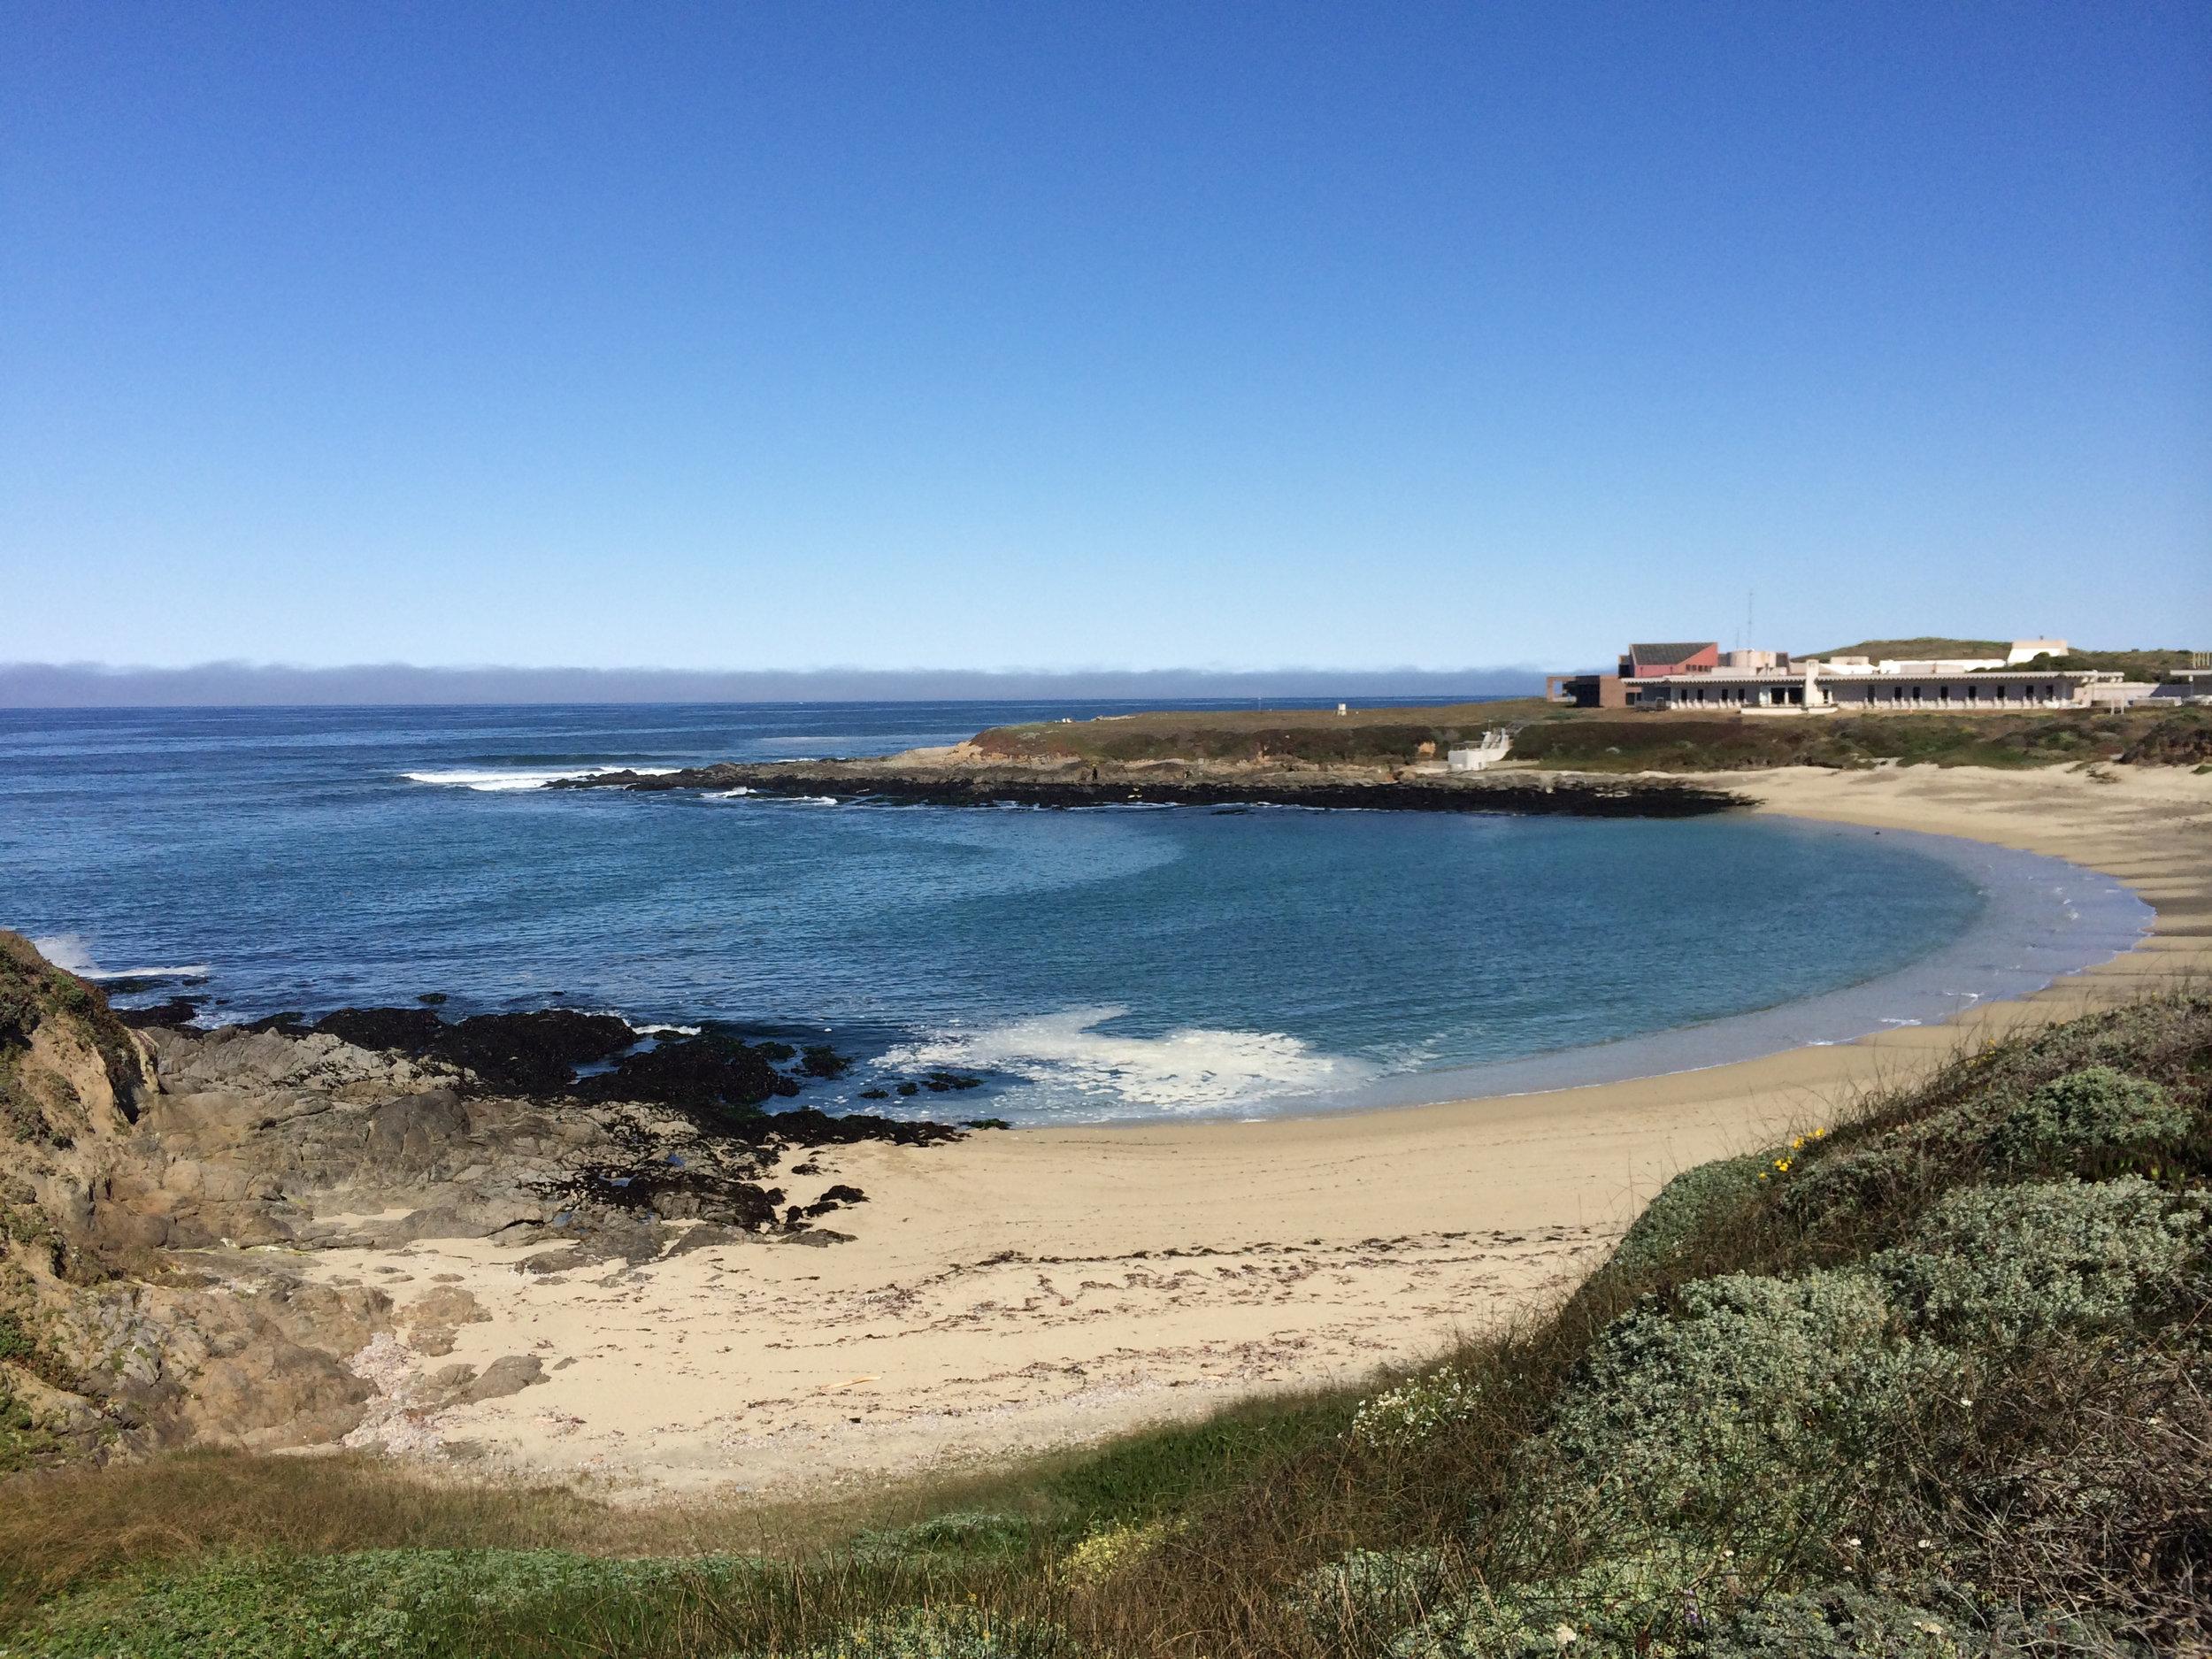 Bodega Marine Laboratory. Photo credit: Tessa Hill